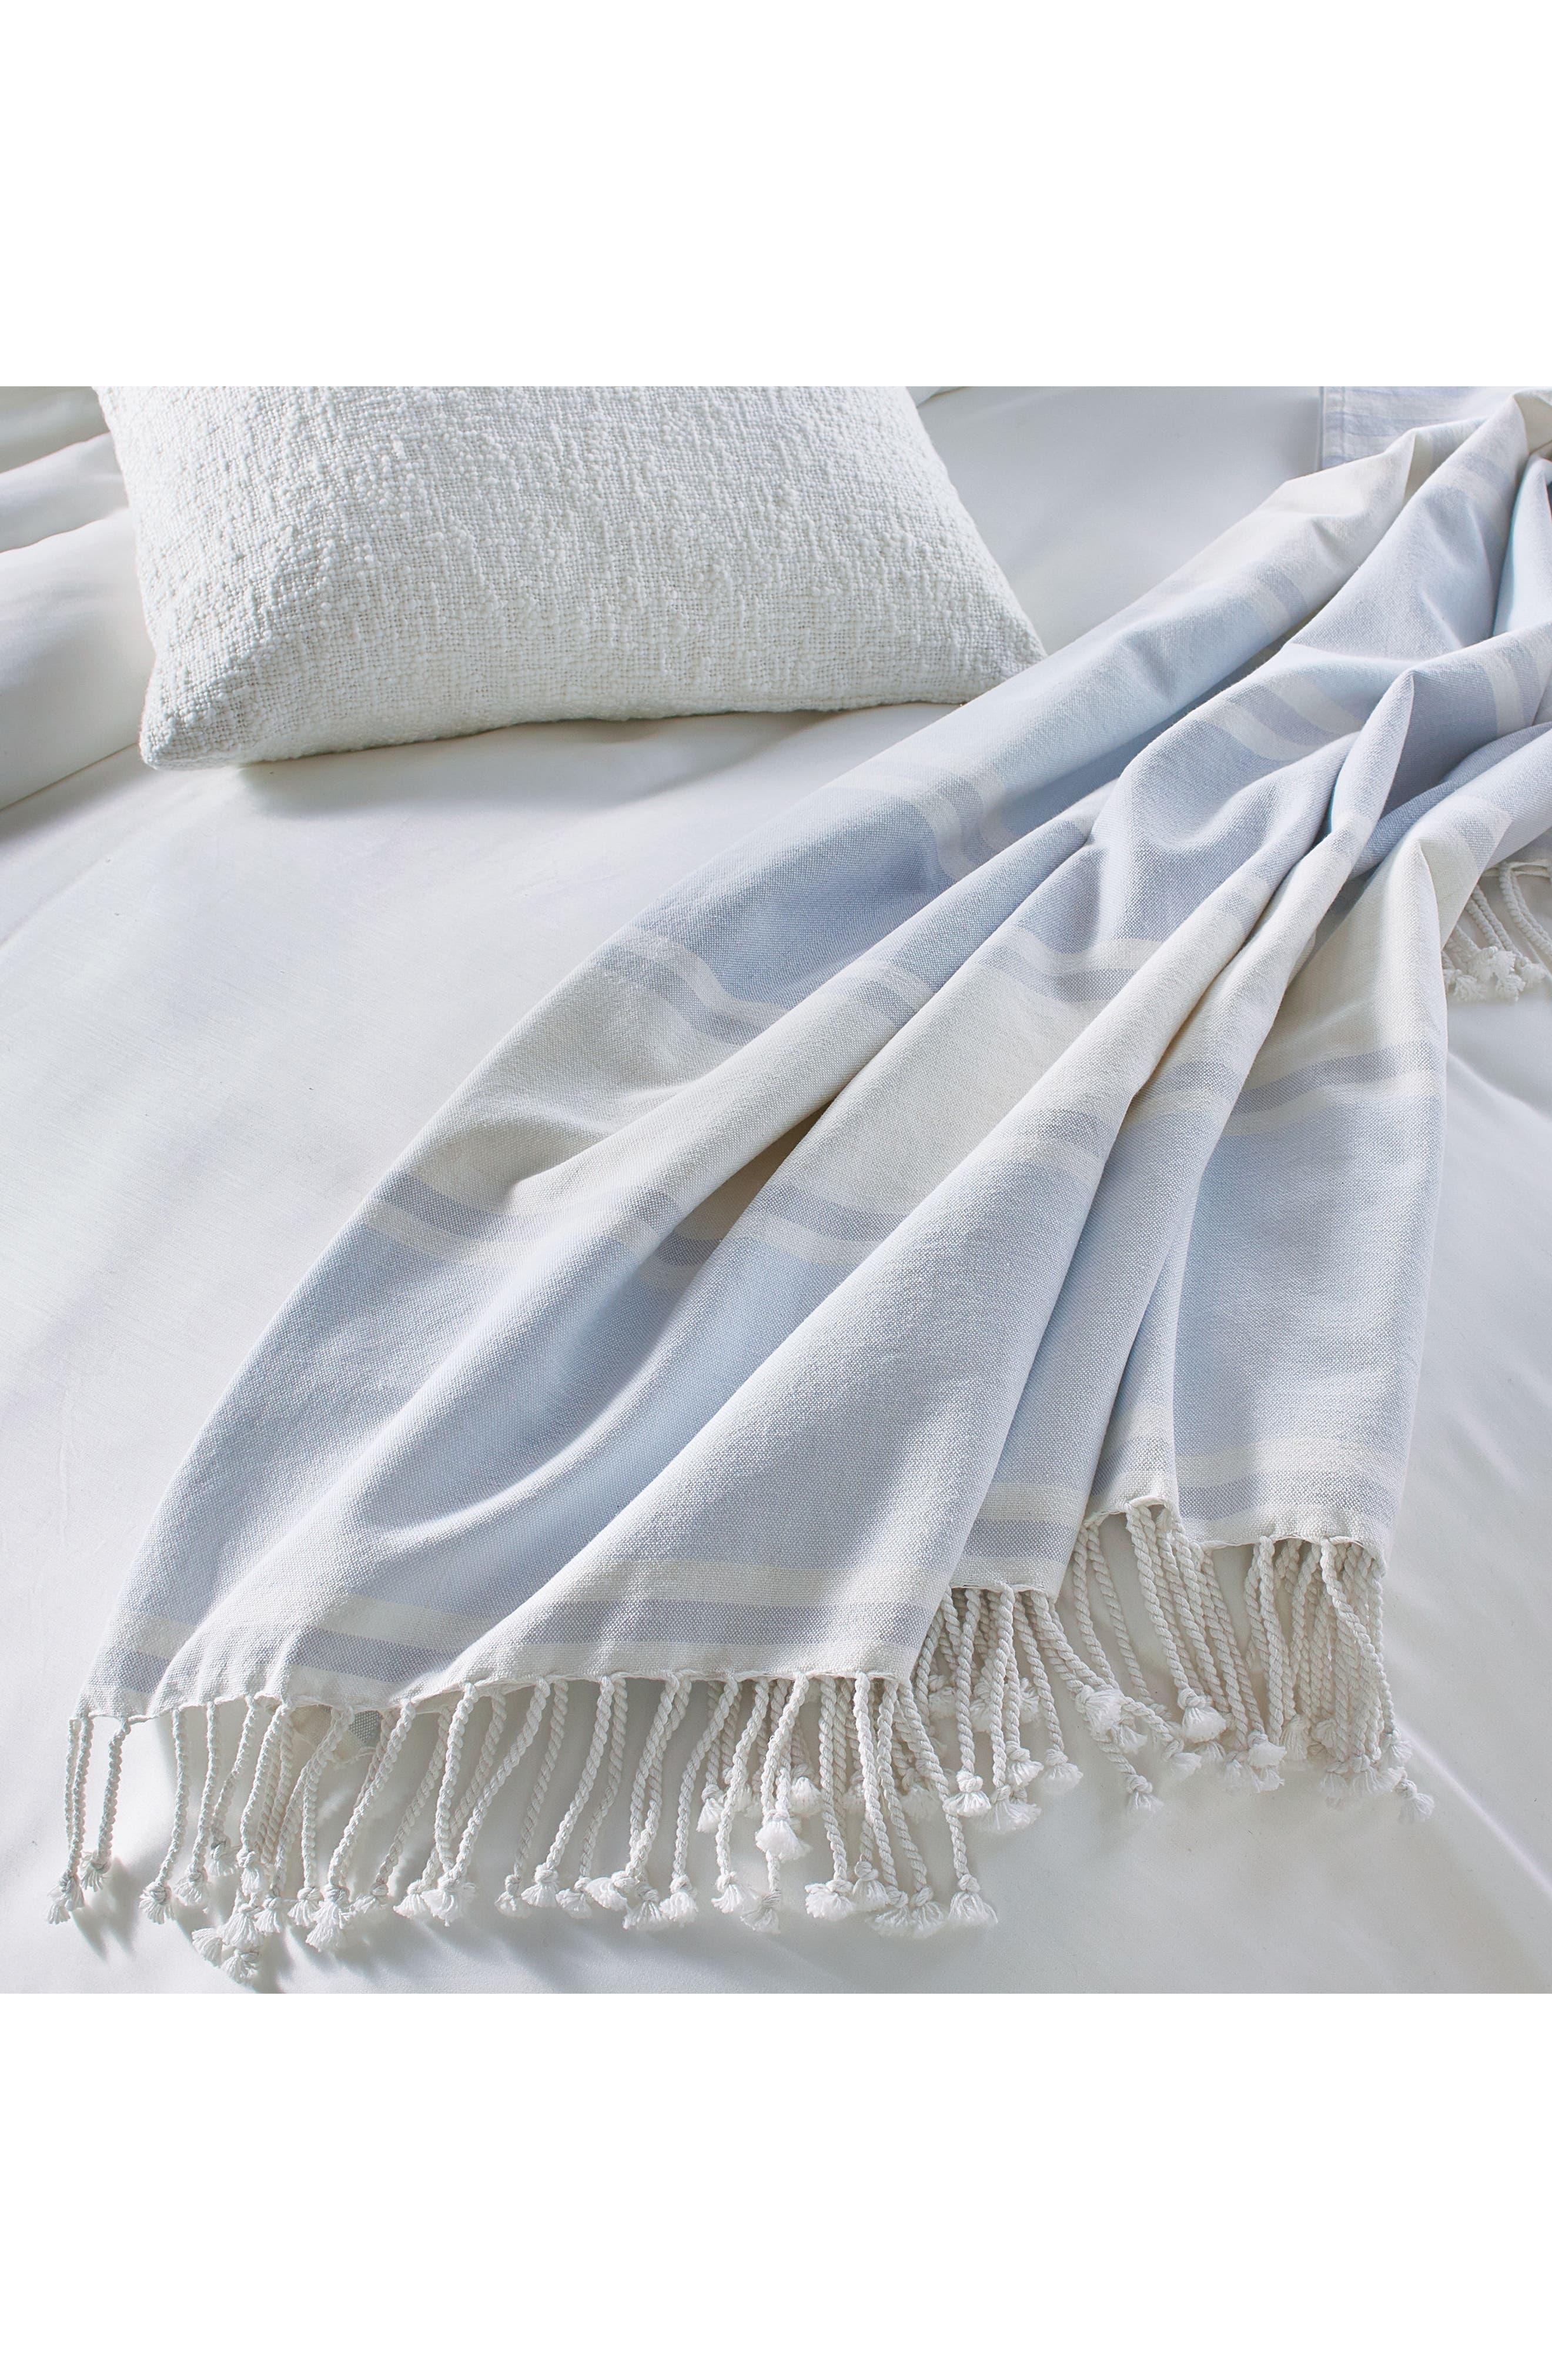 DKNY, Donna Karan New York Pure Stripe Blanket, Alternate thumbnail 2, color, BLUE